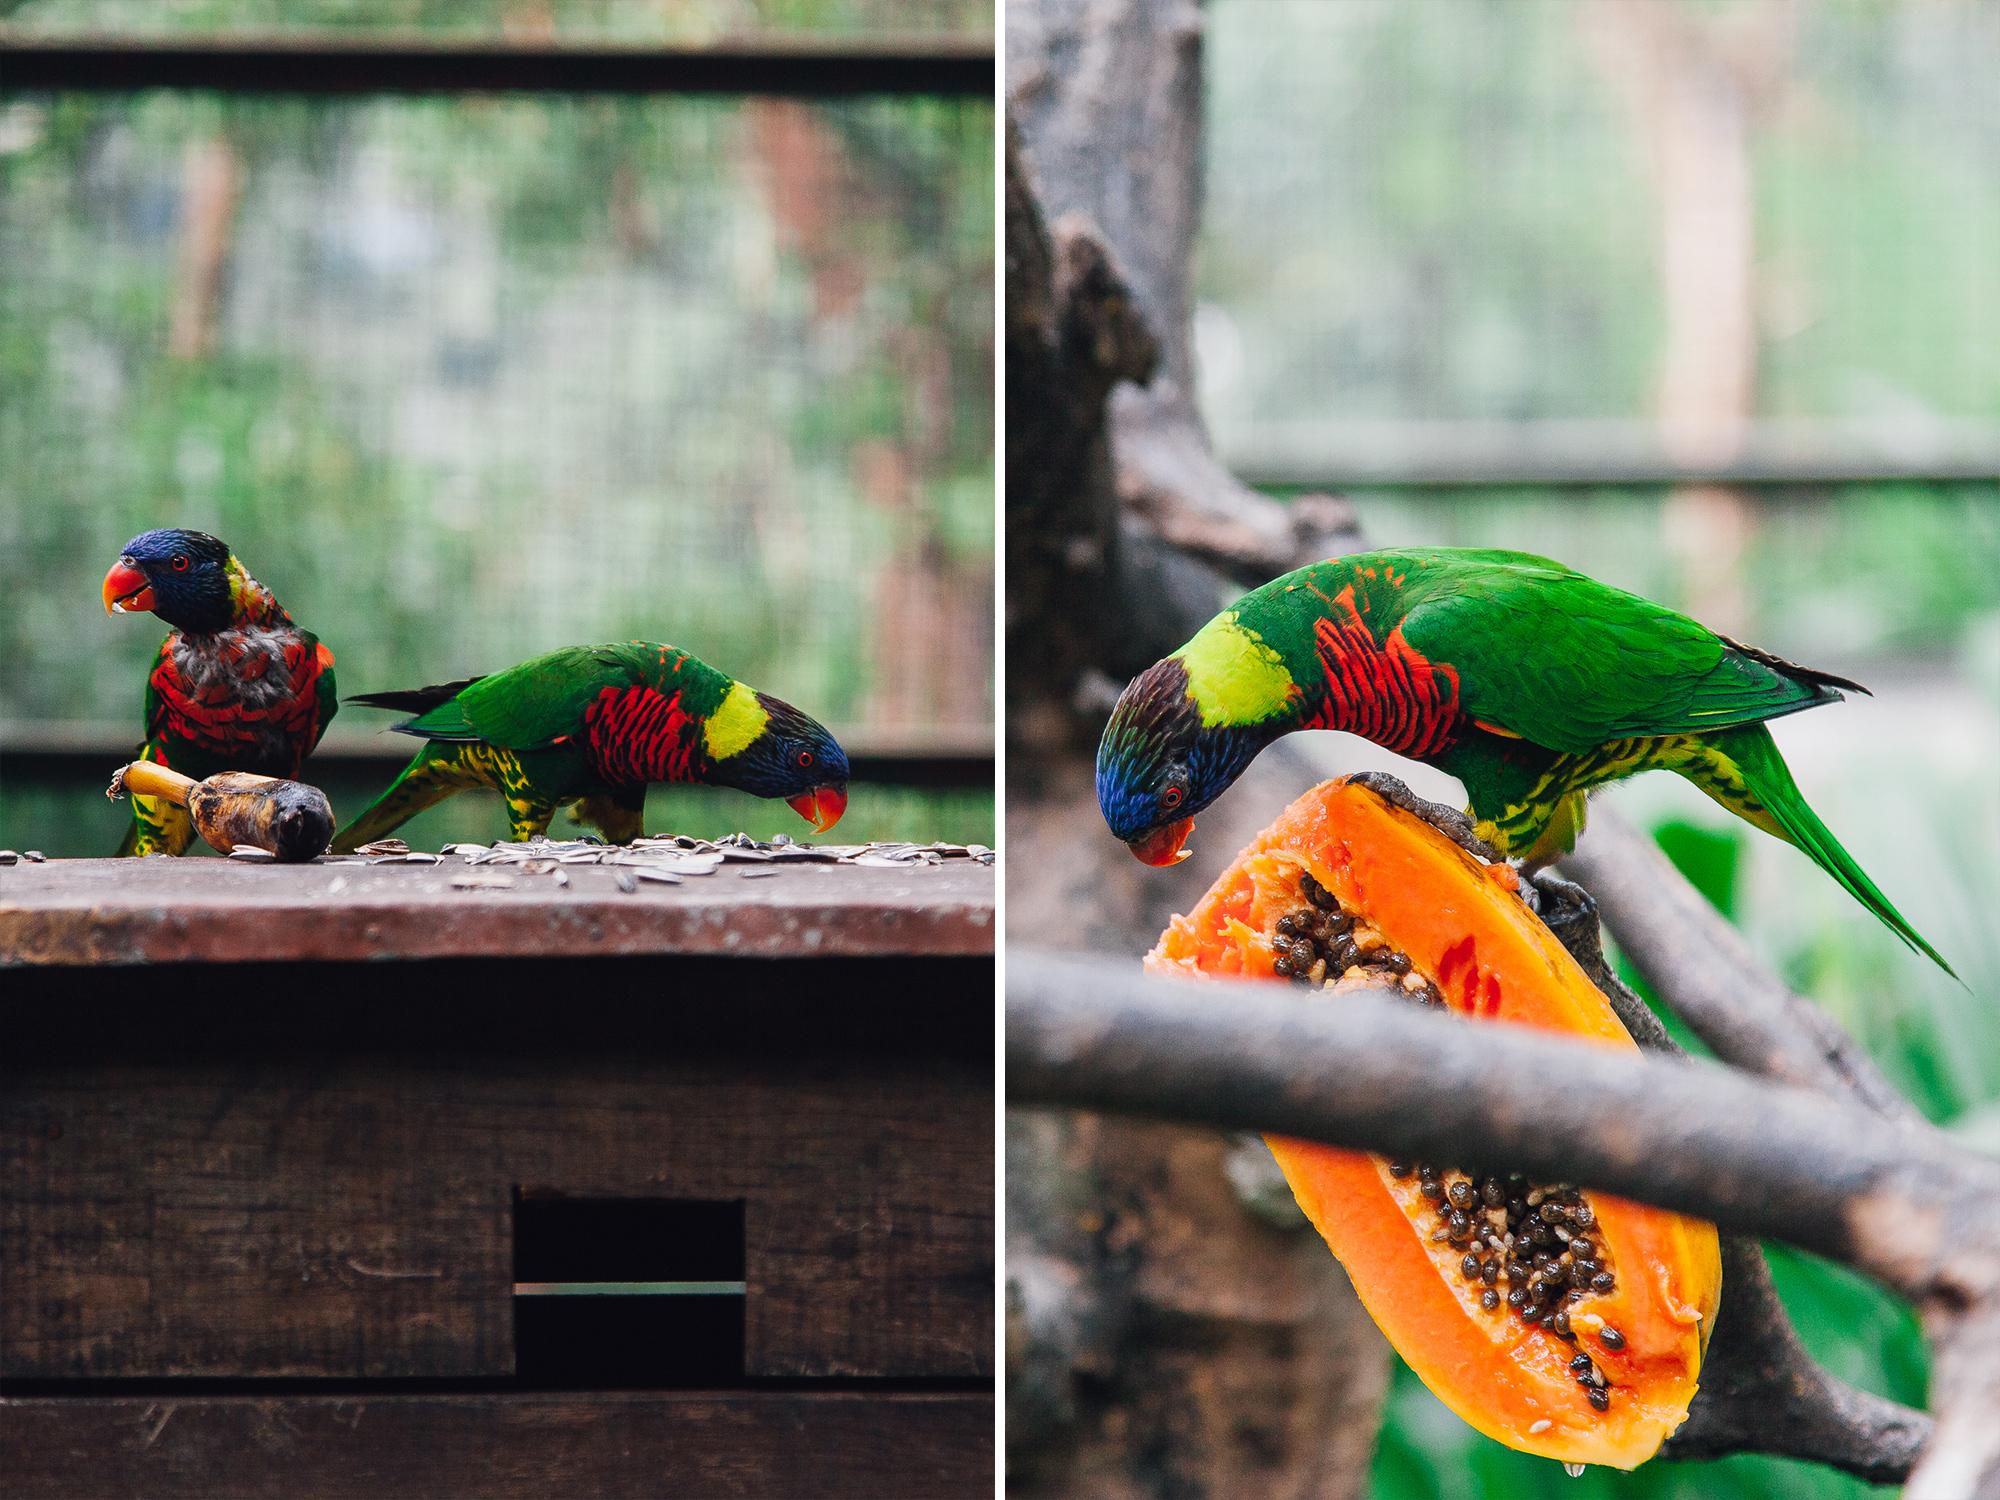 birddiptych.jpg